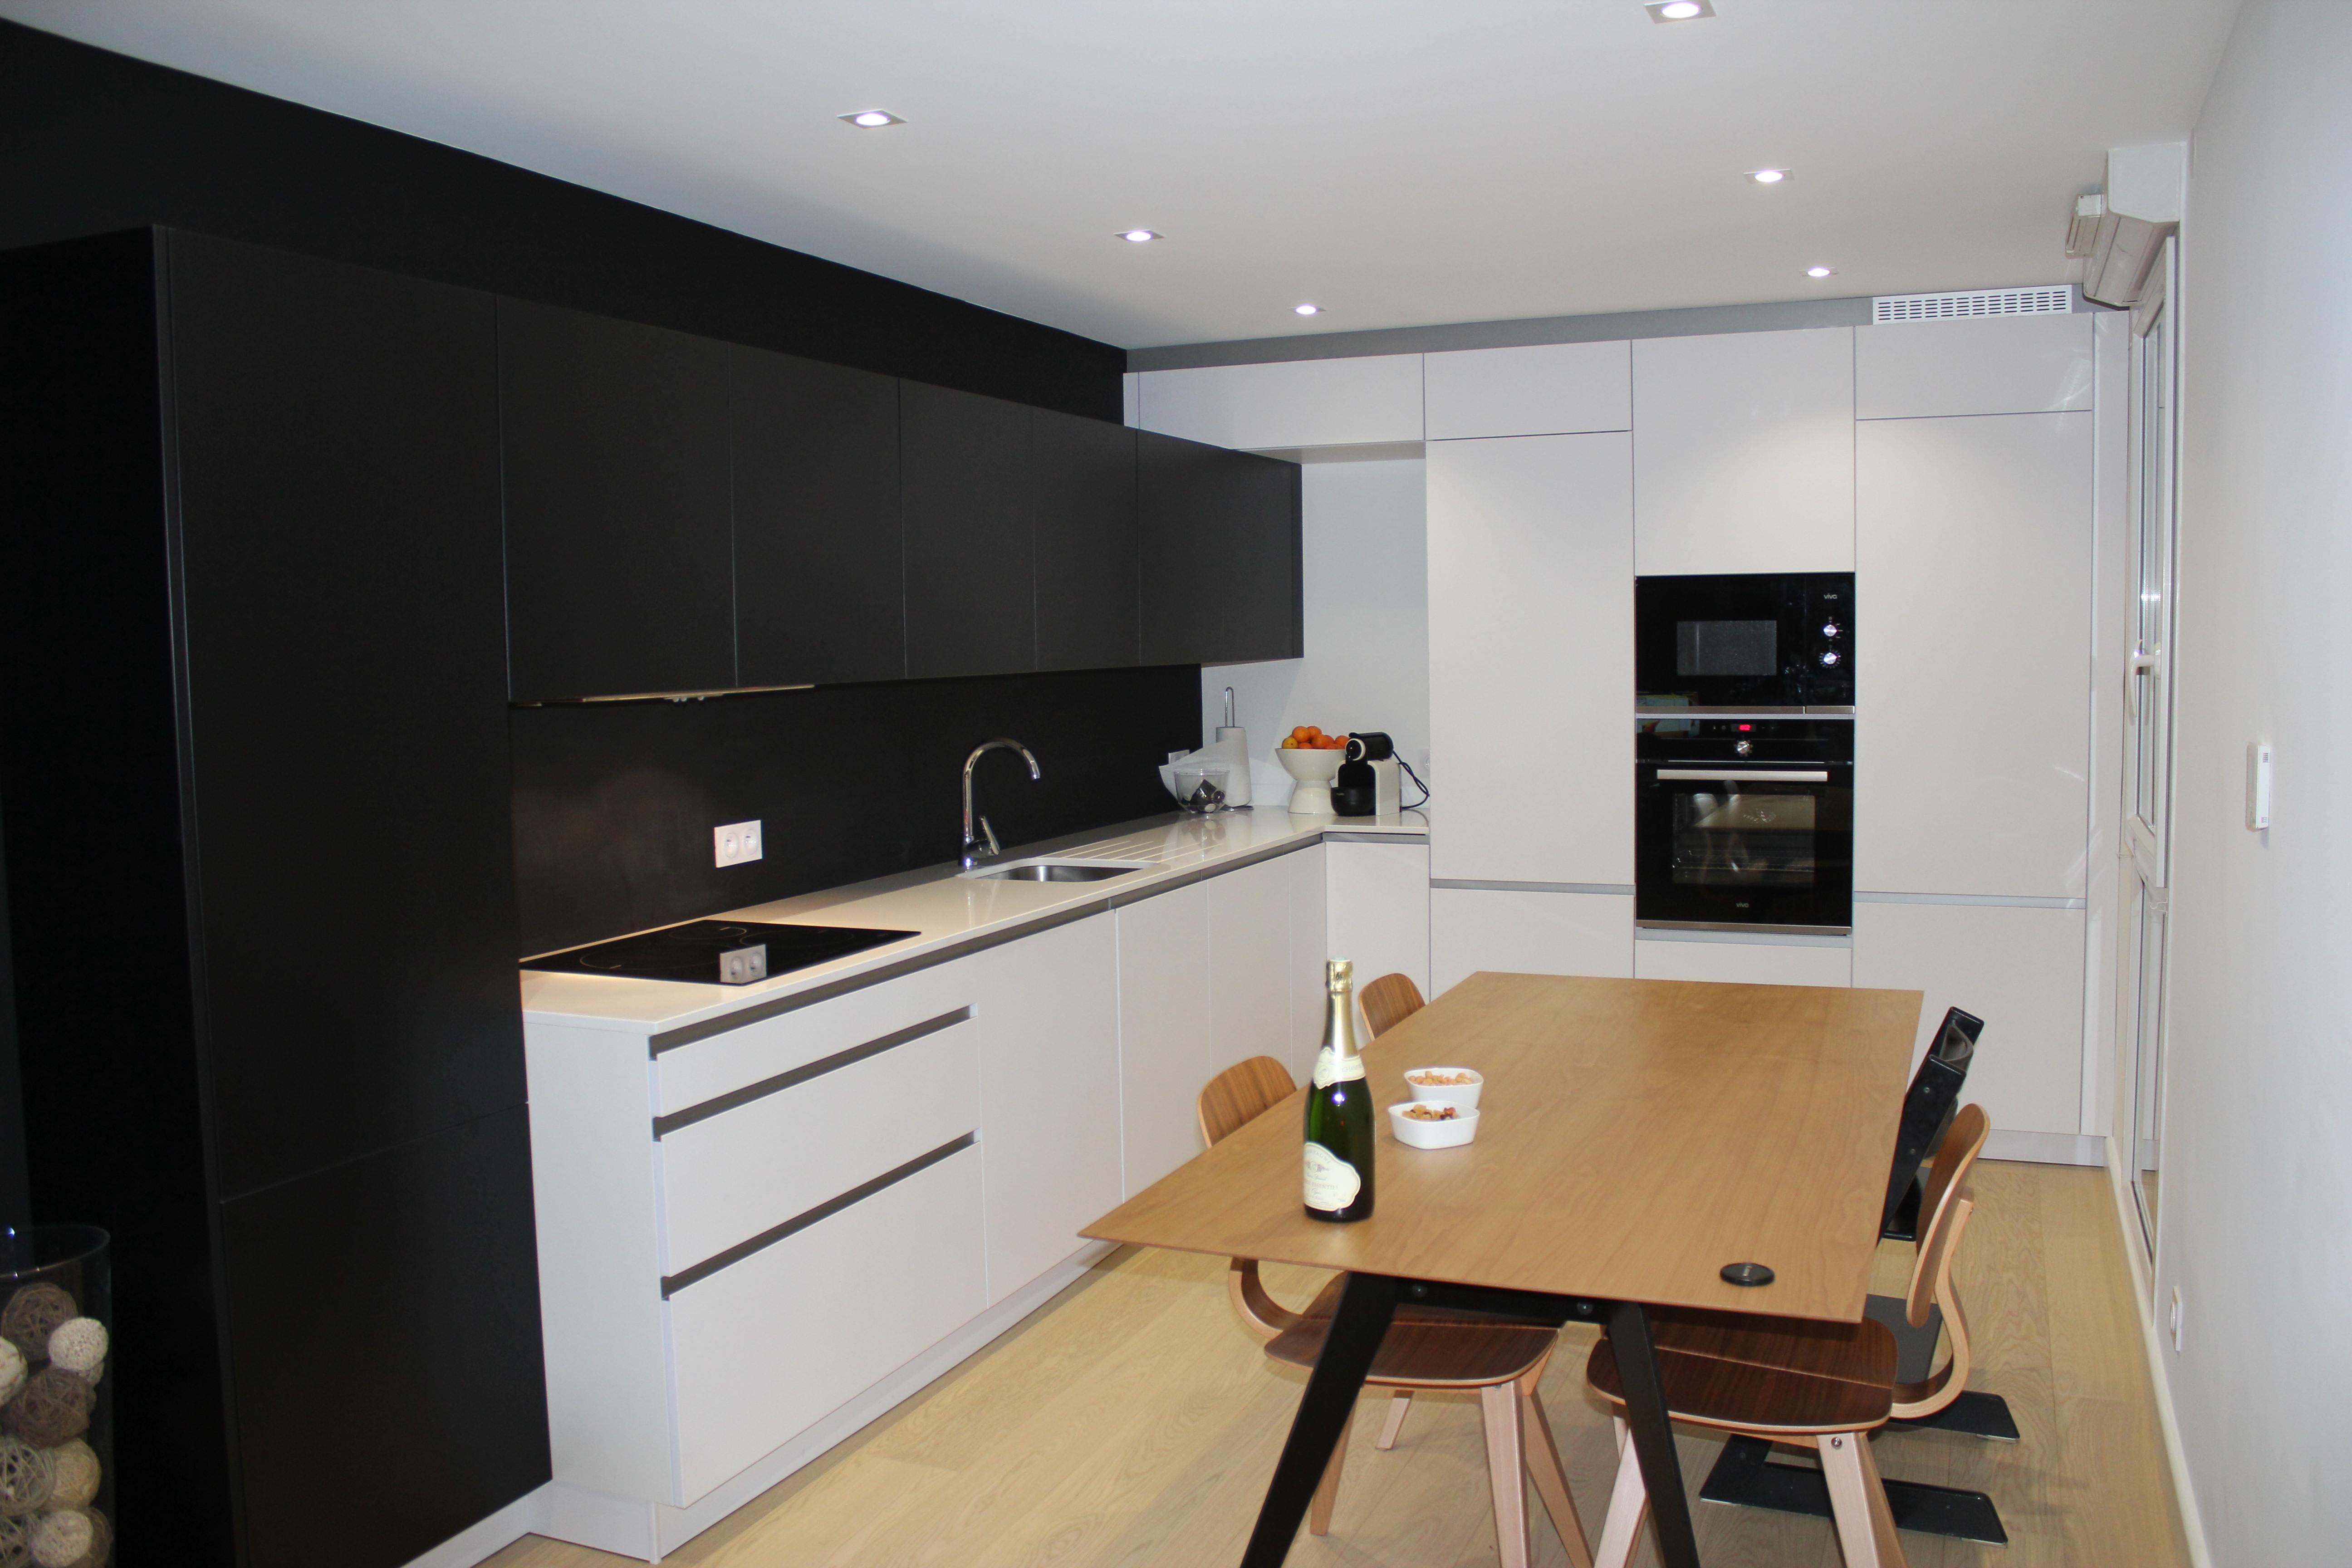 Modernite Cuisine Equipee Blanche Et Resine Noire Cuisine A Annecy